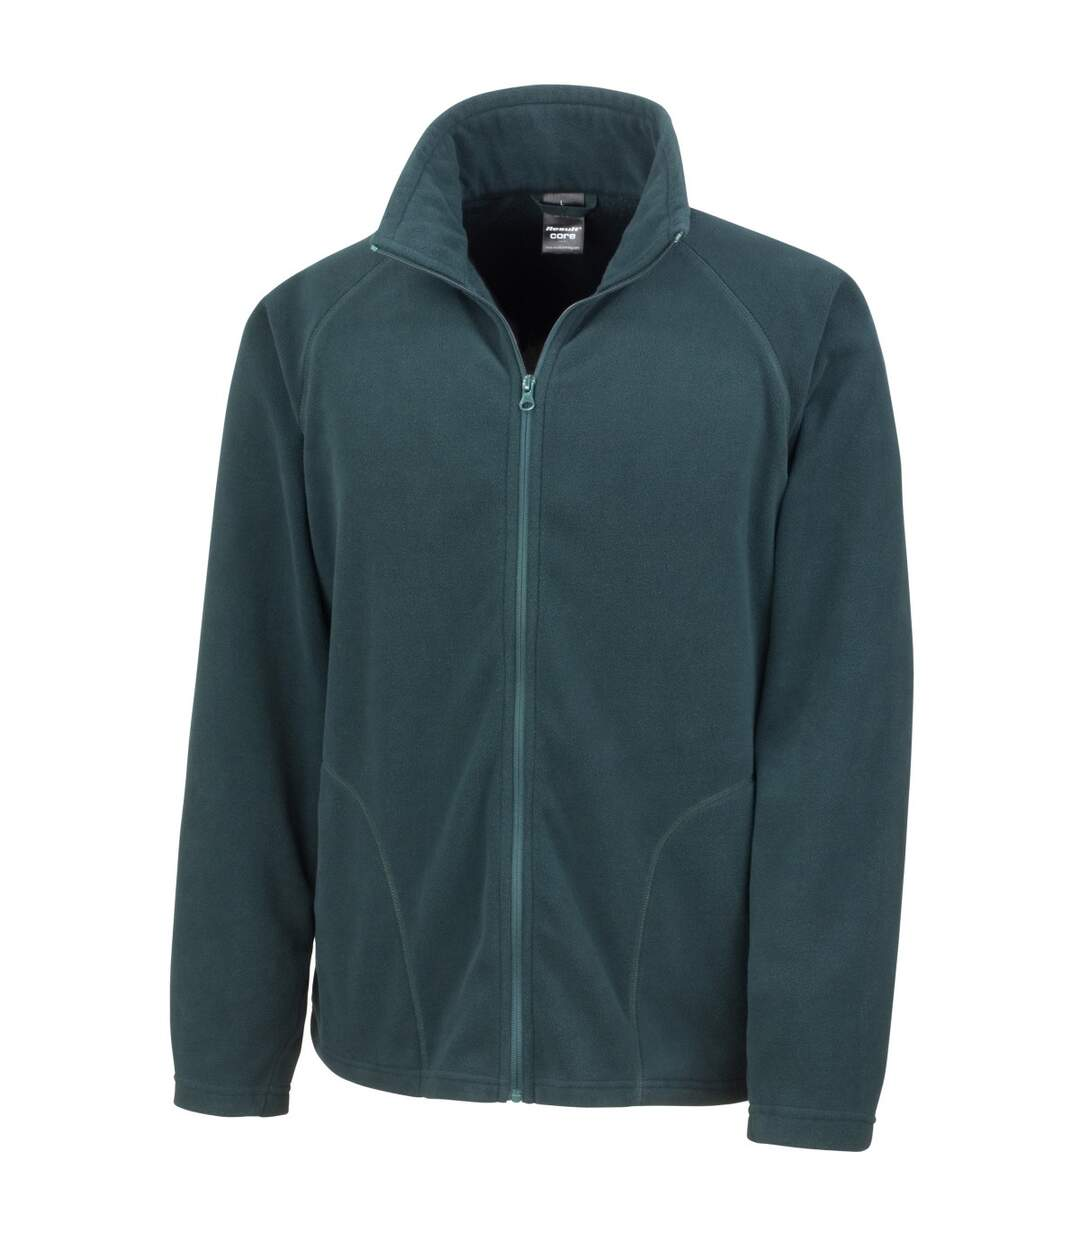 Result Core Mens Micron Anti Pill Fleece Jacket (Orange) - UTBC852